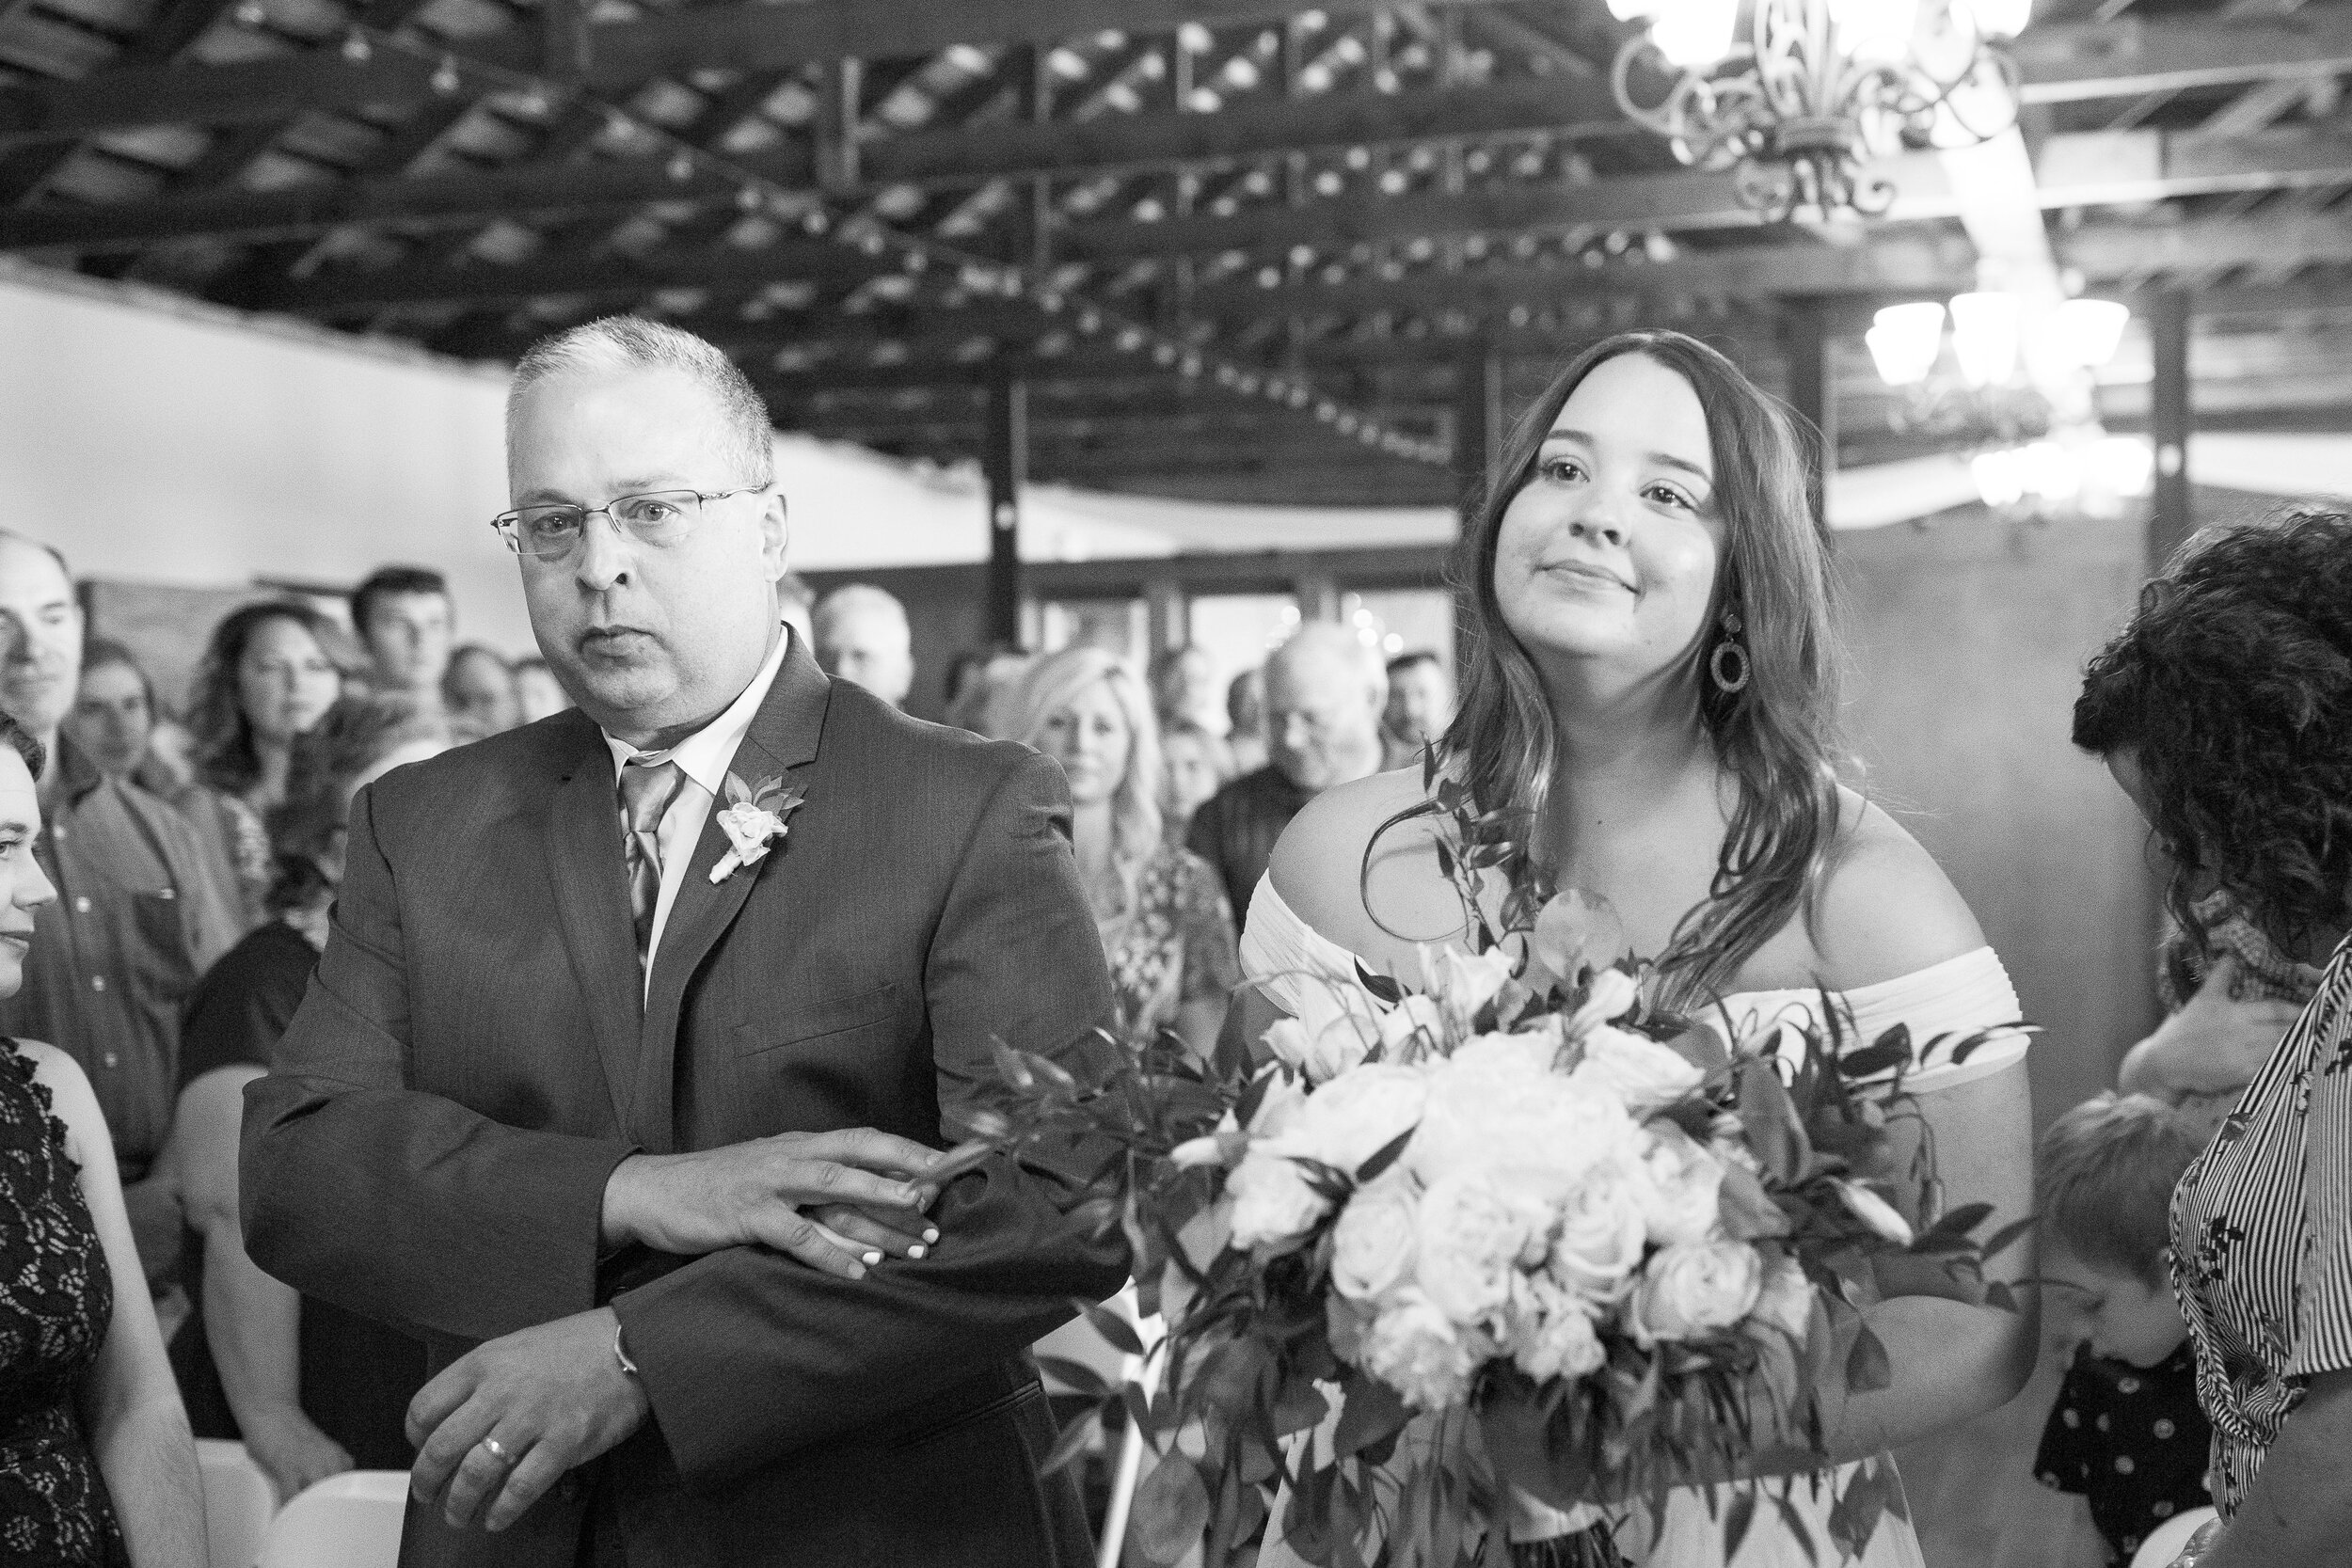 walking down the aisle spokane bride and groom